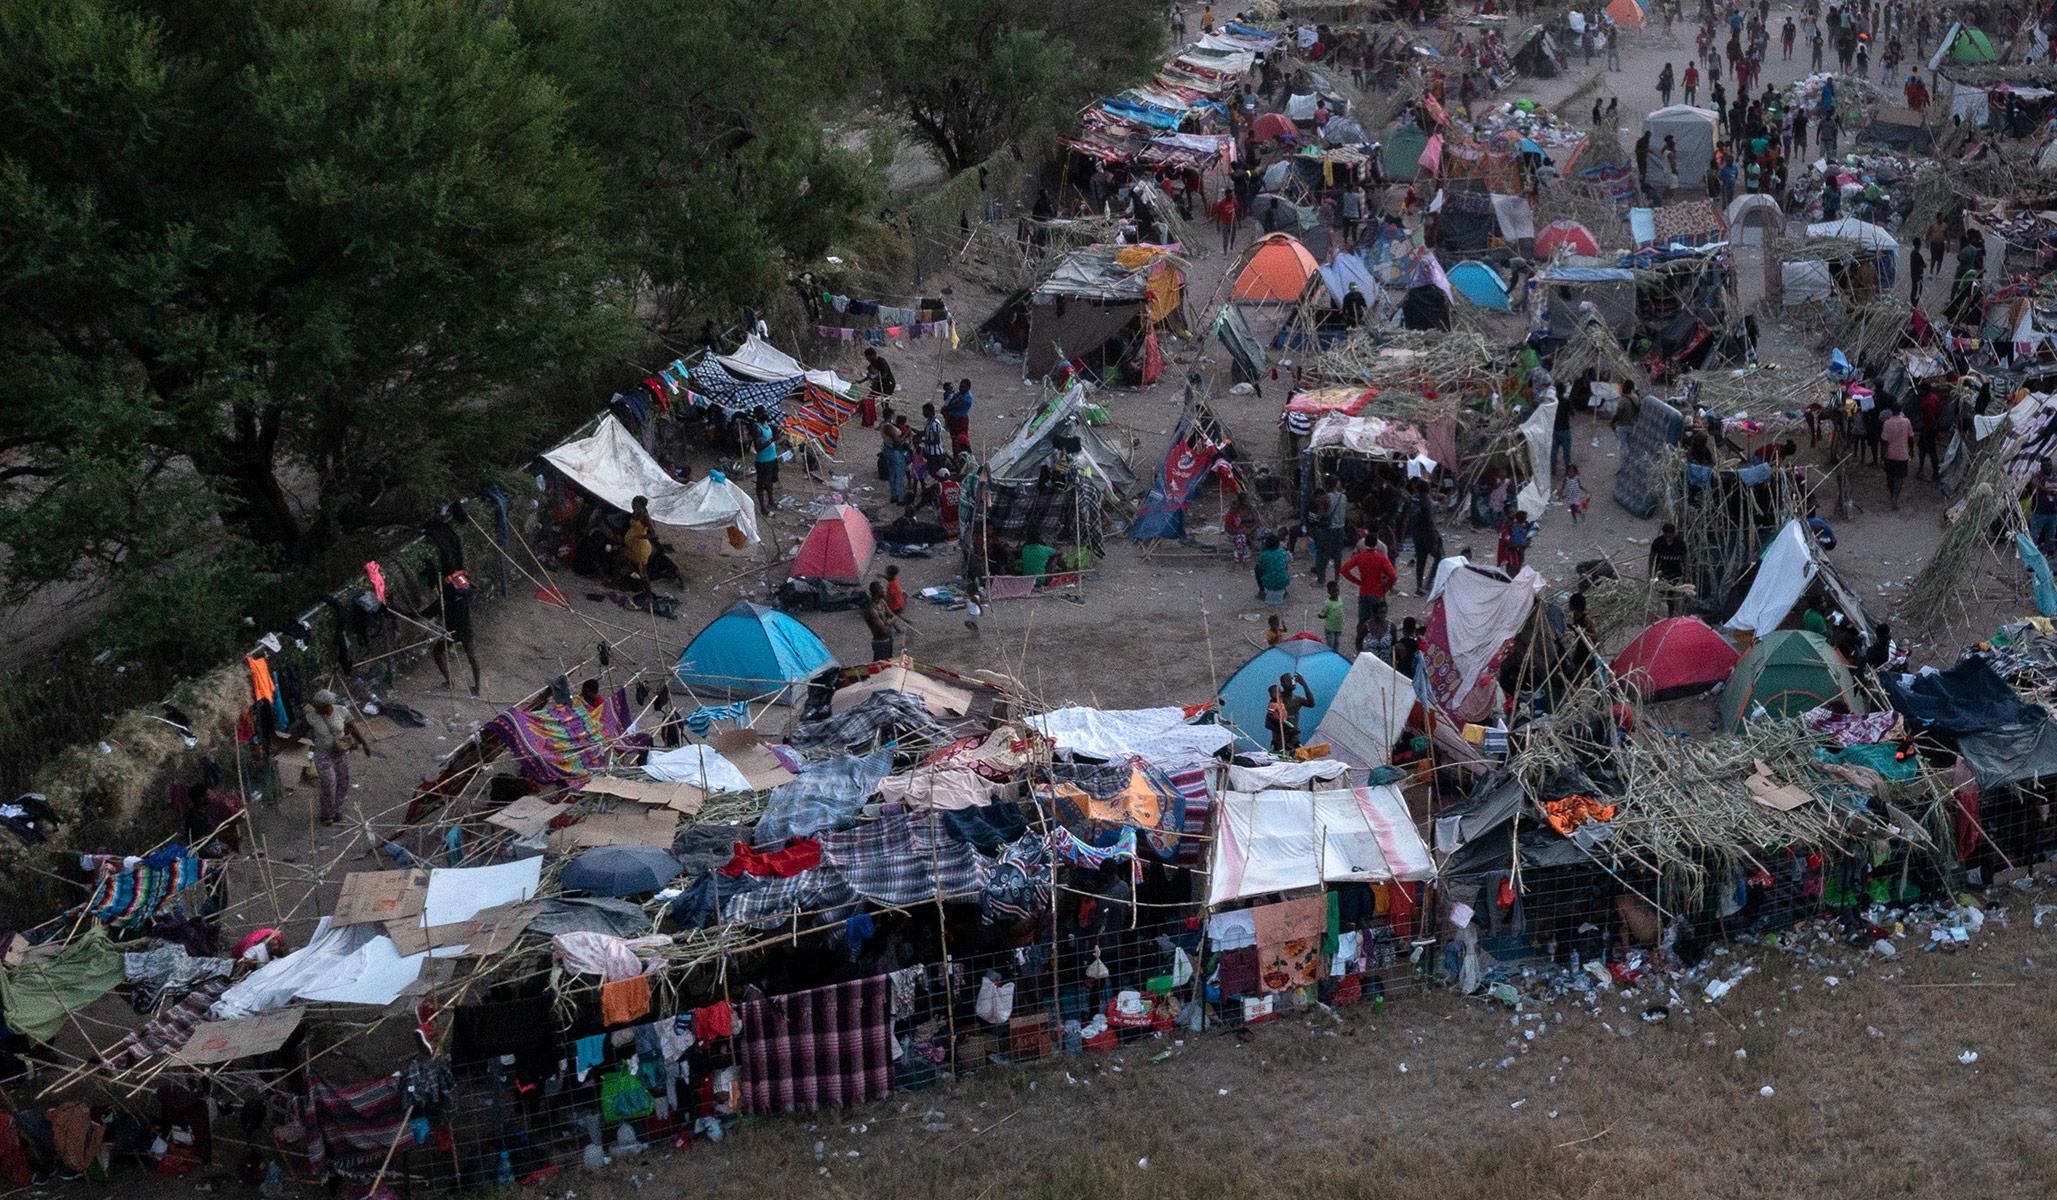 Massive Migrant Caravan Begins Journey to U.S. from Mexico